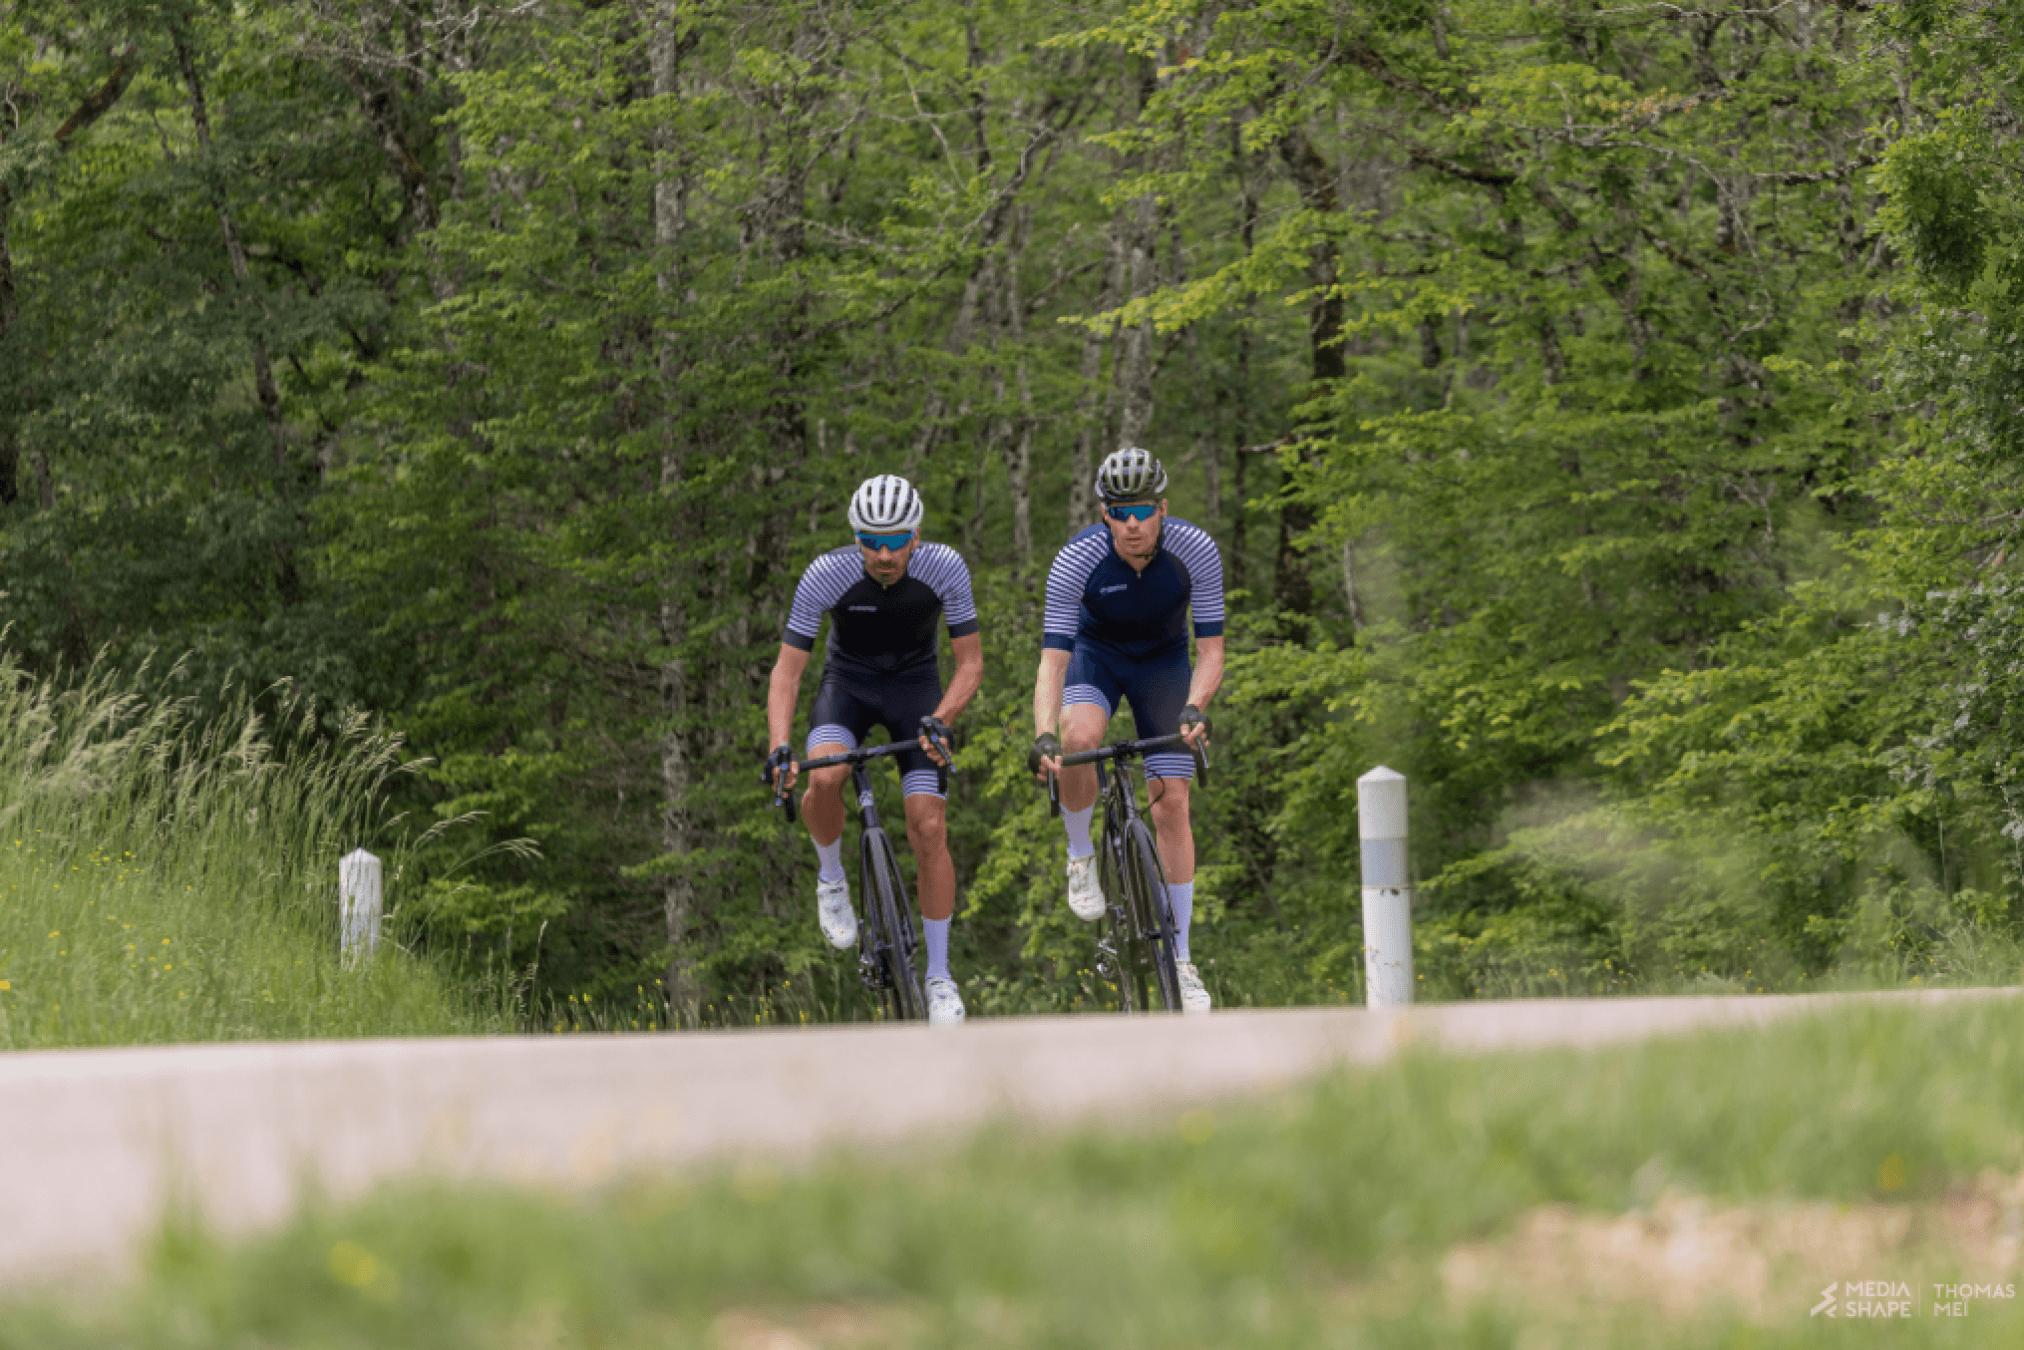 cyclistes maillots rayés en foret